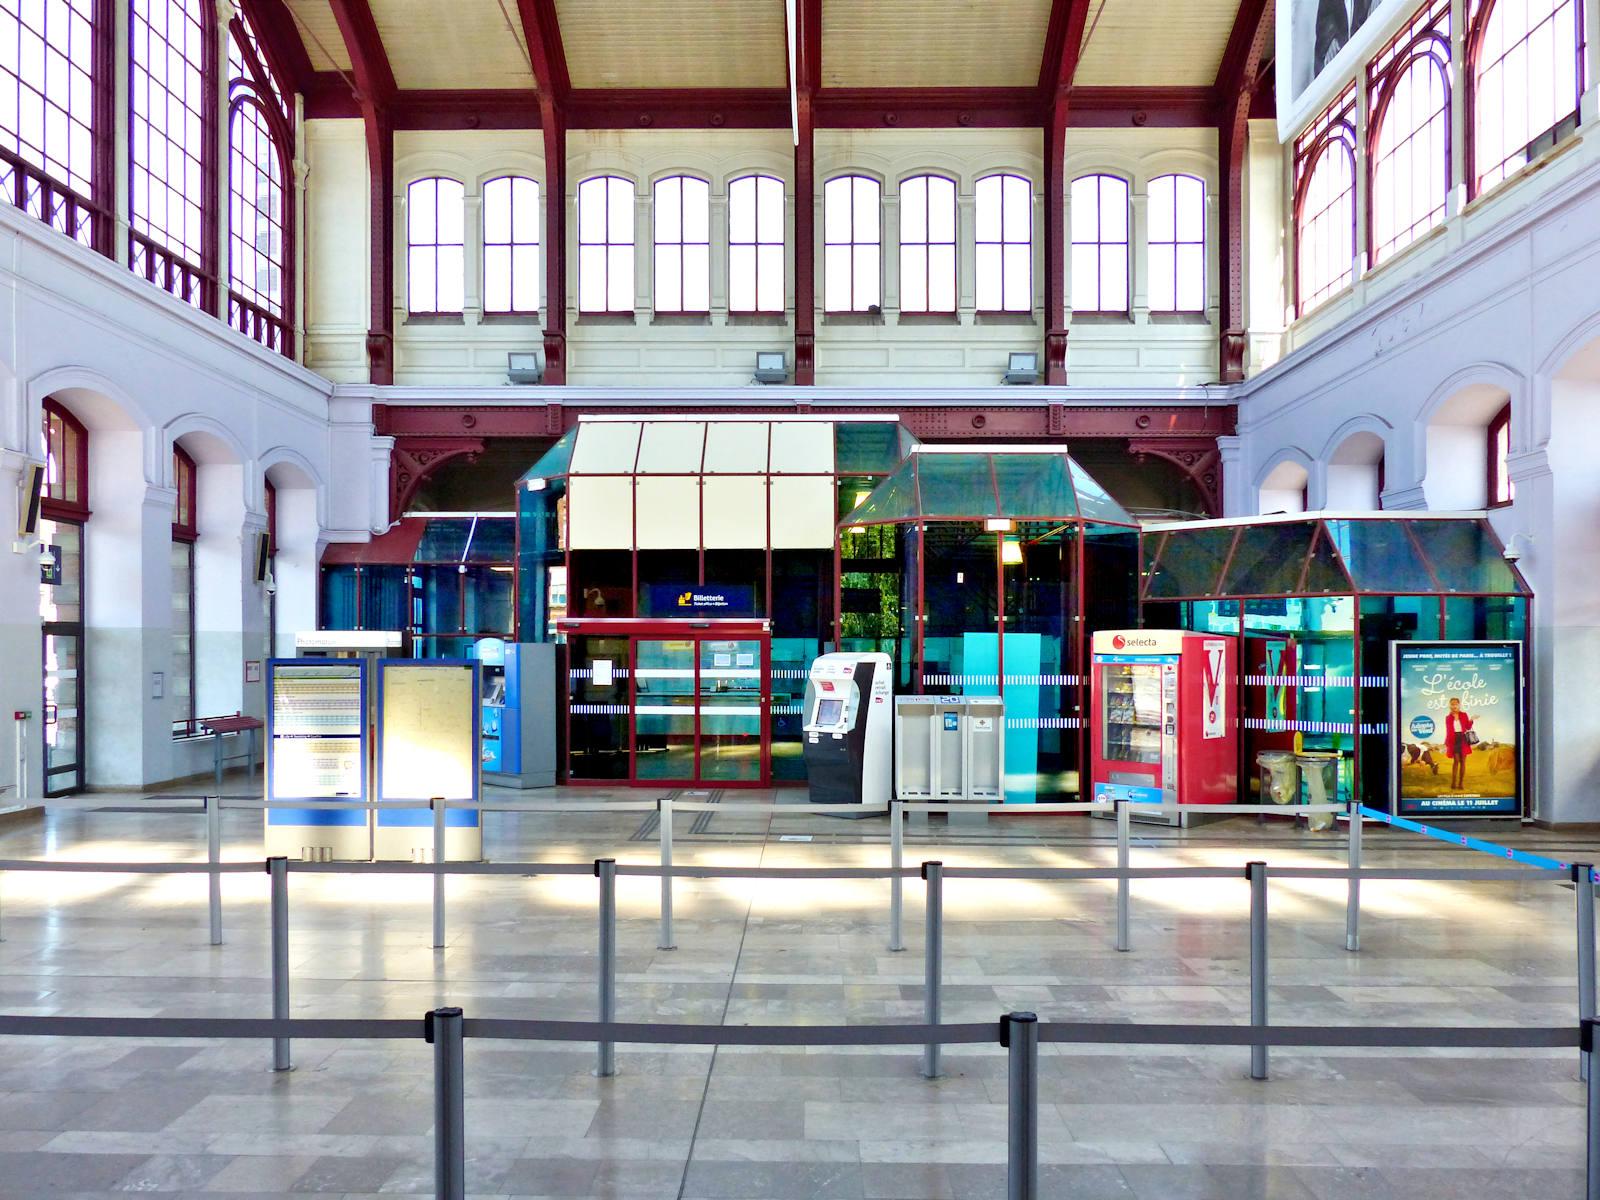 Gare de Tourcoing - Hall de la gare